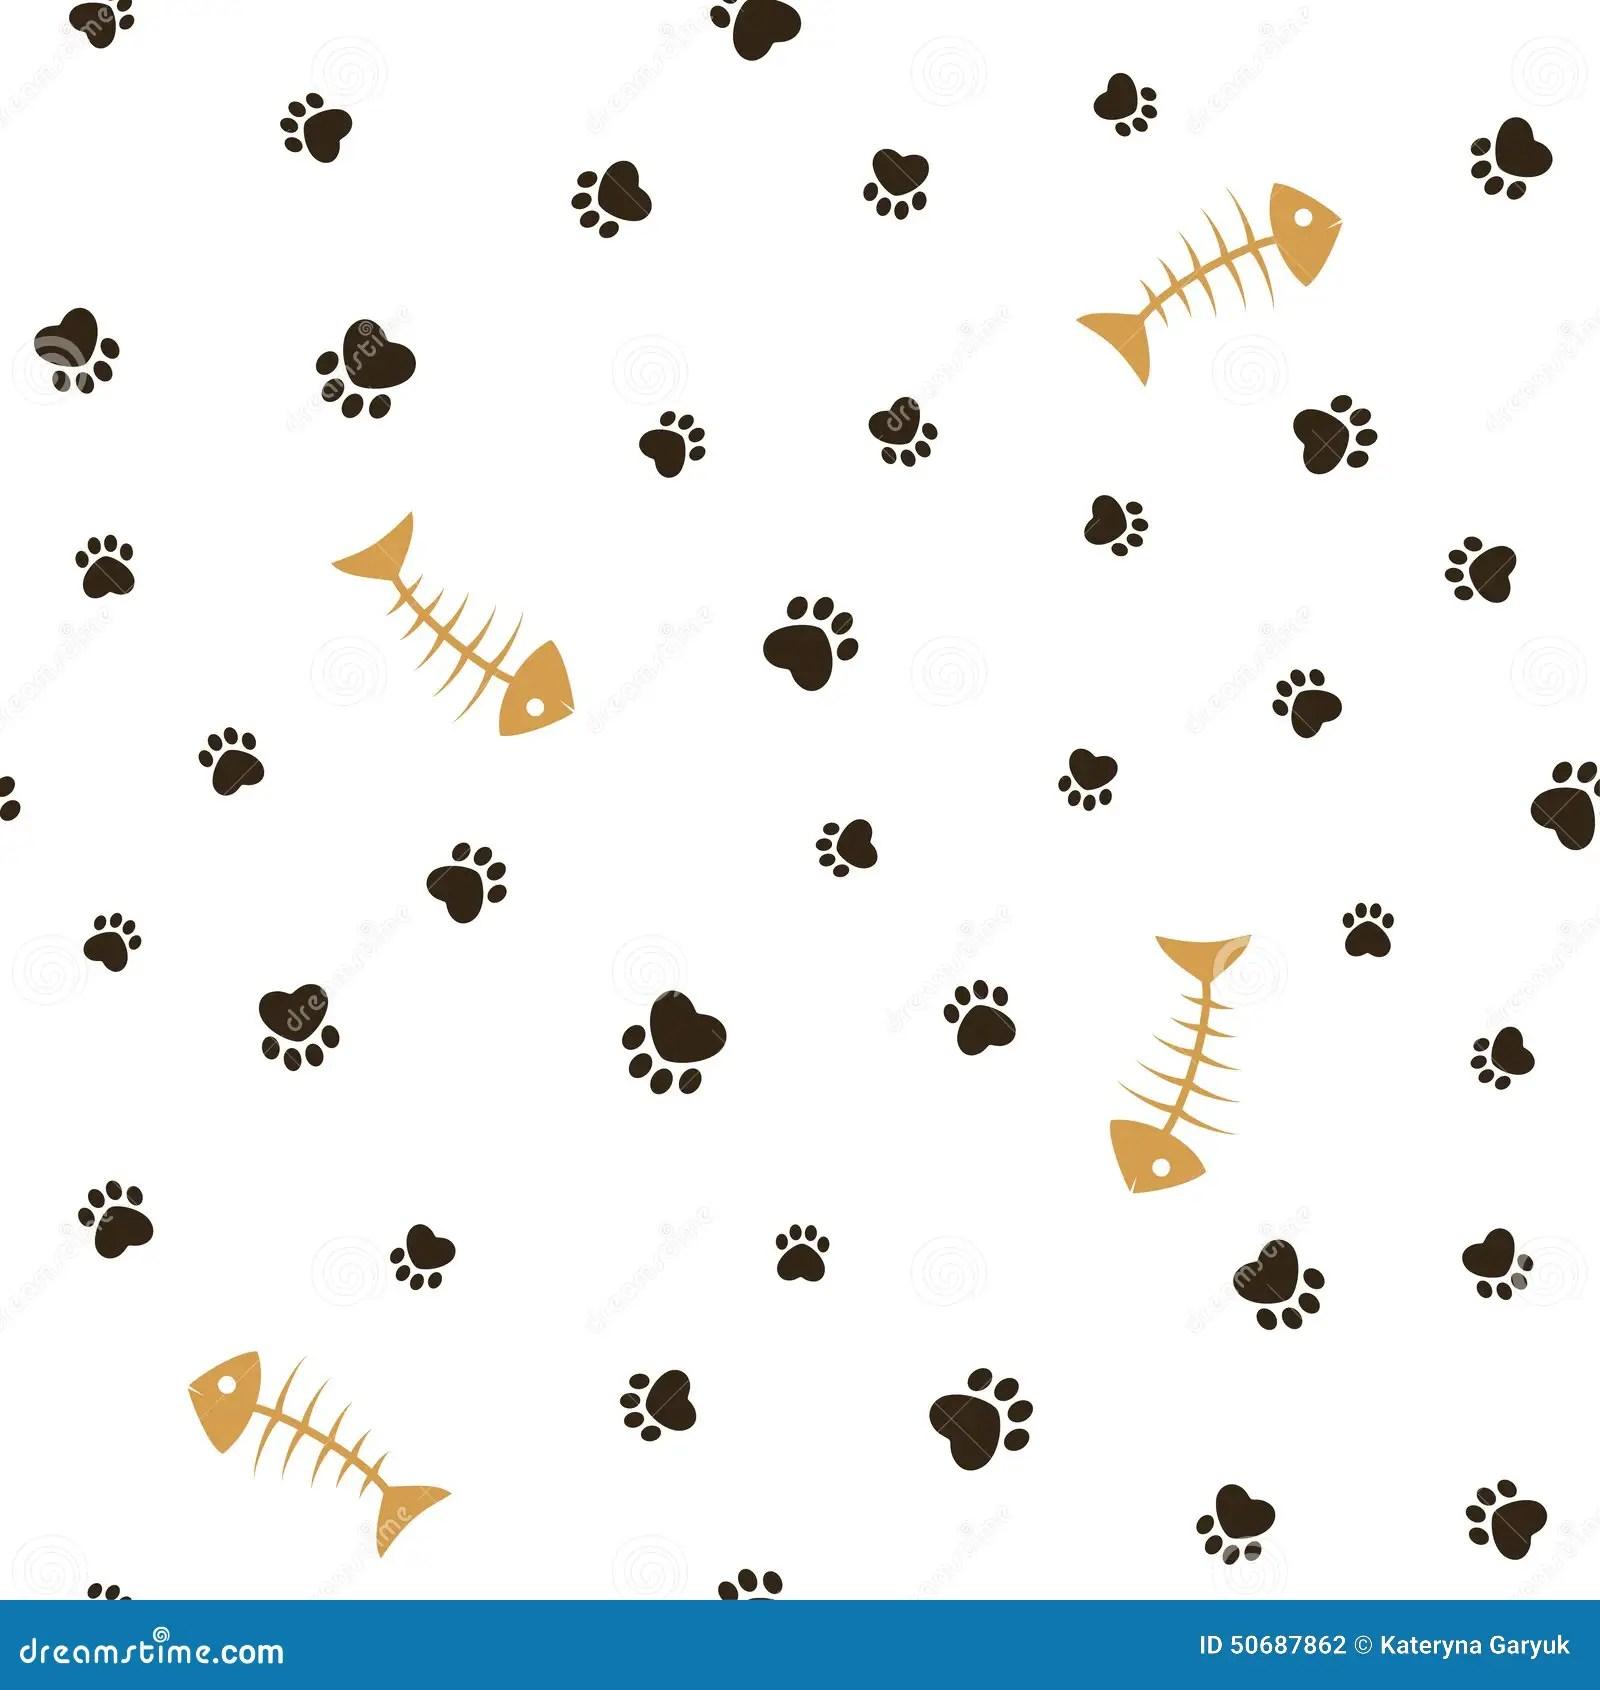 Skeleton Pattern Wallpaper Cute Cat Theme Seamless Background Stock Vector Image 50687862